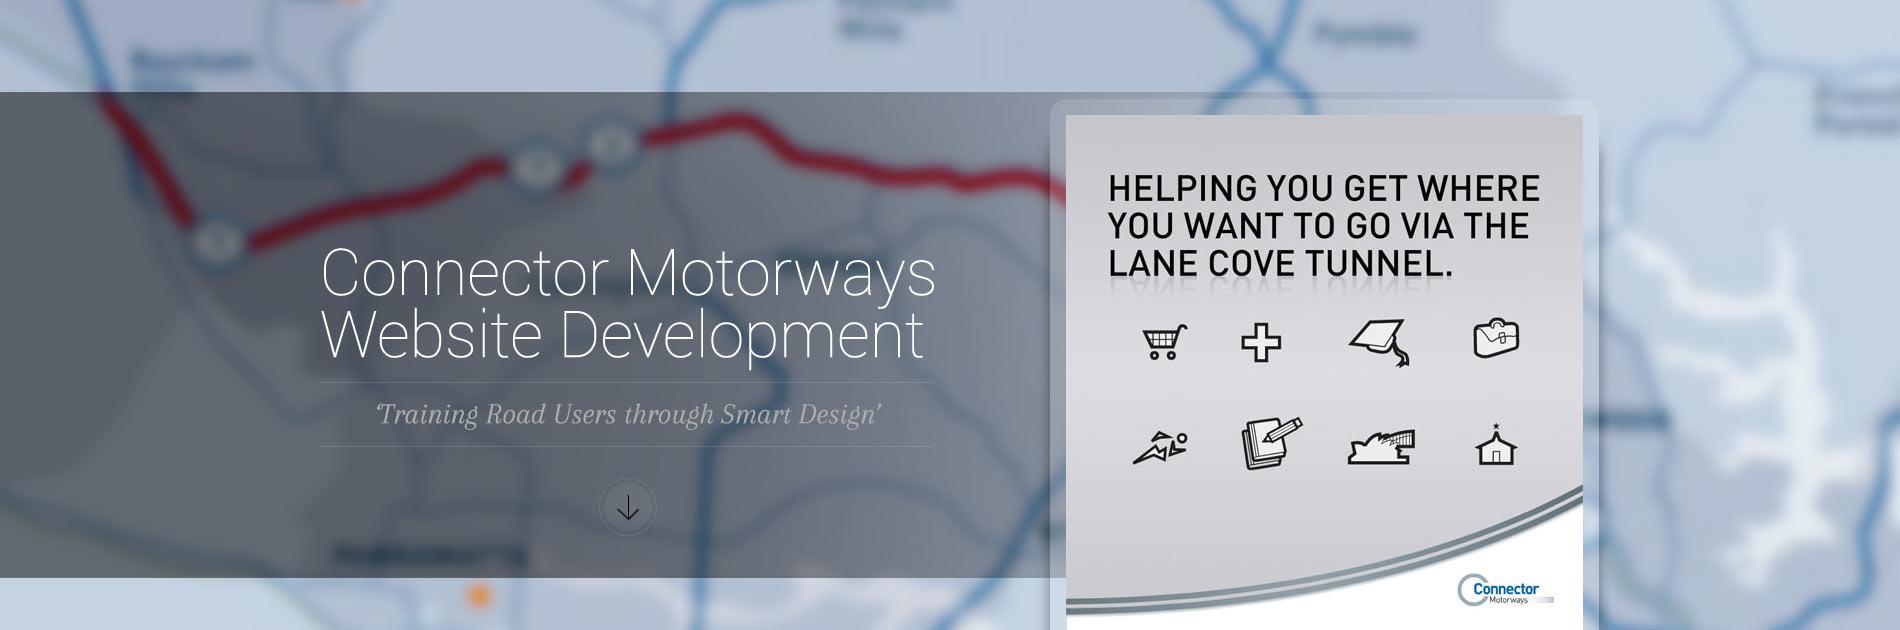 Connector Motorways Website Development